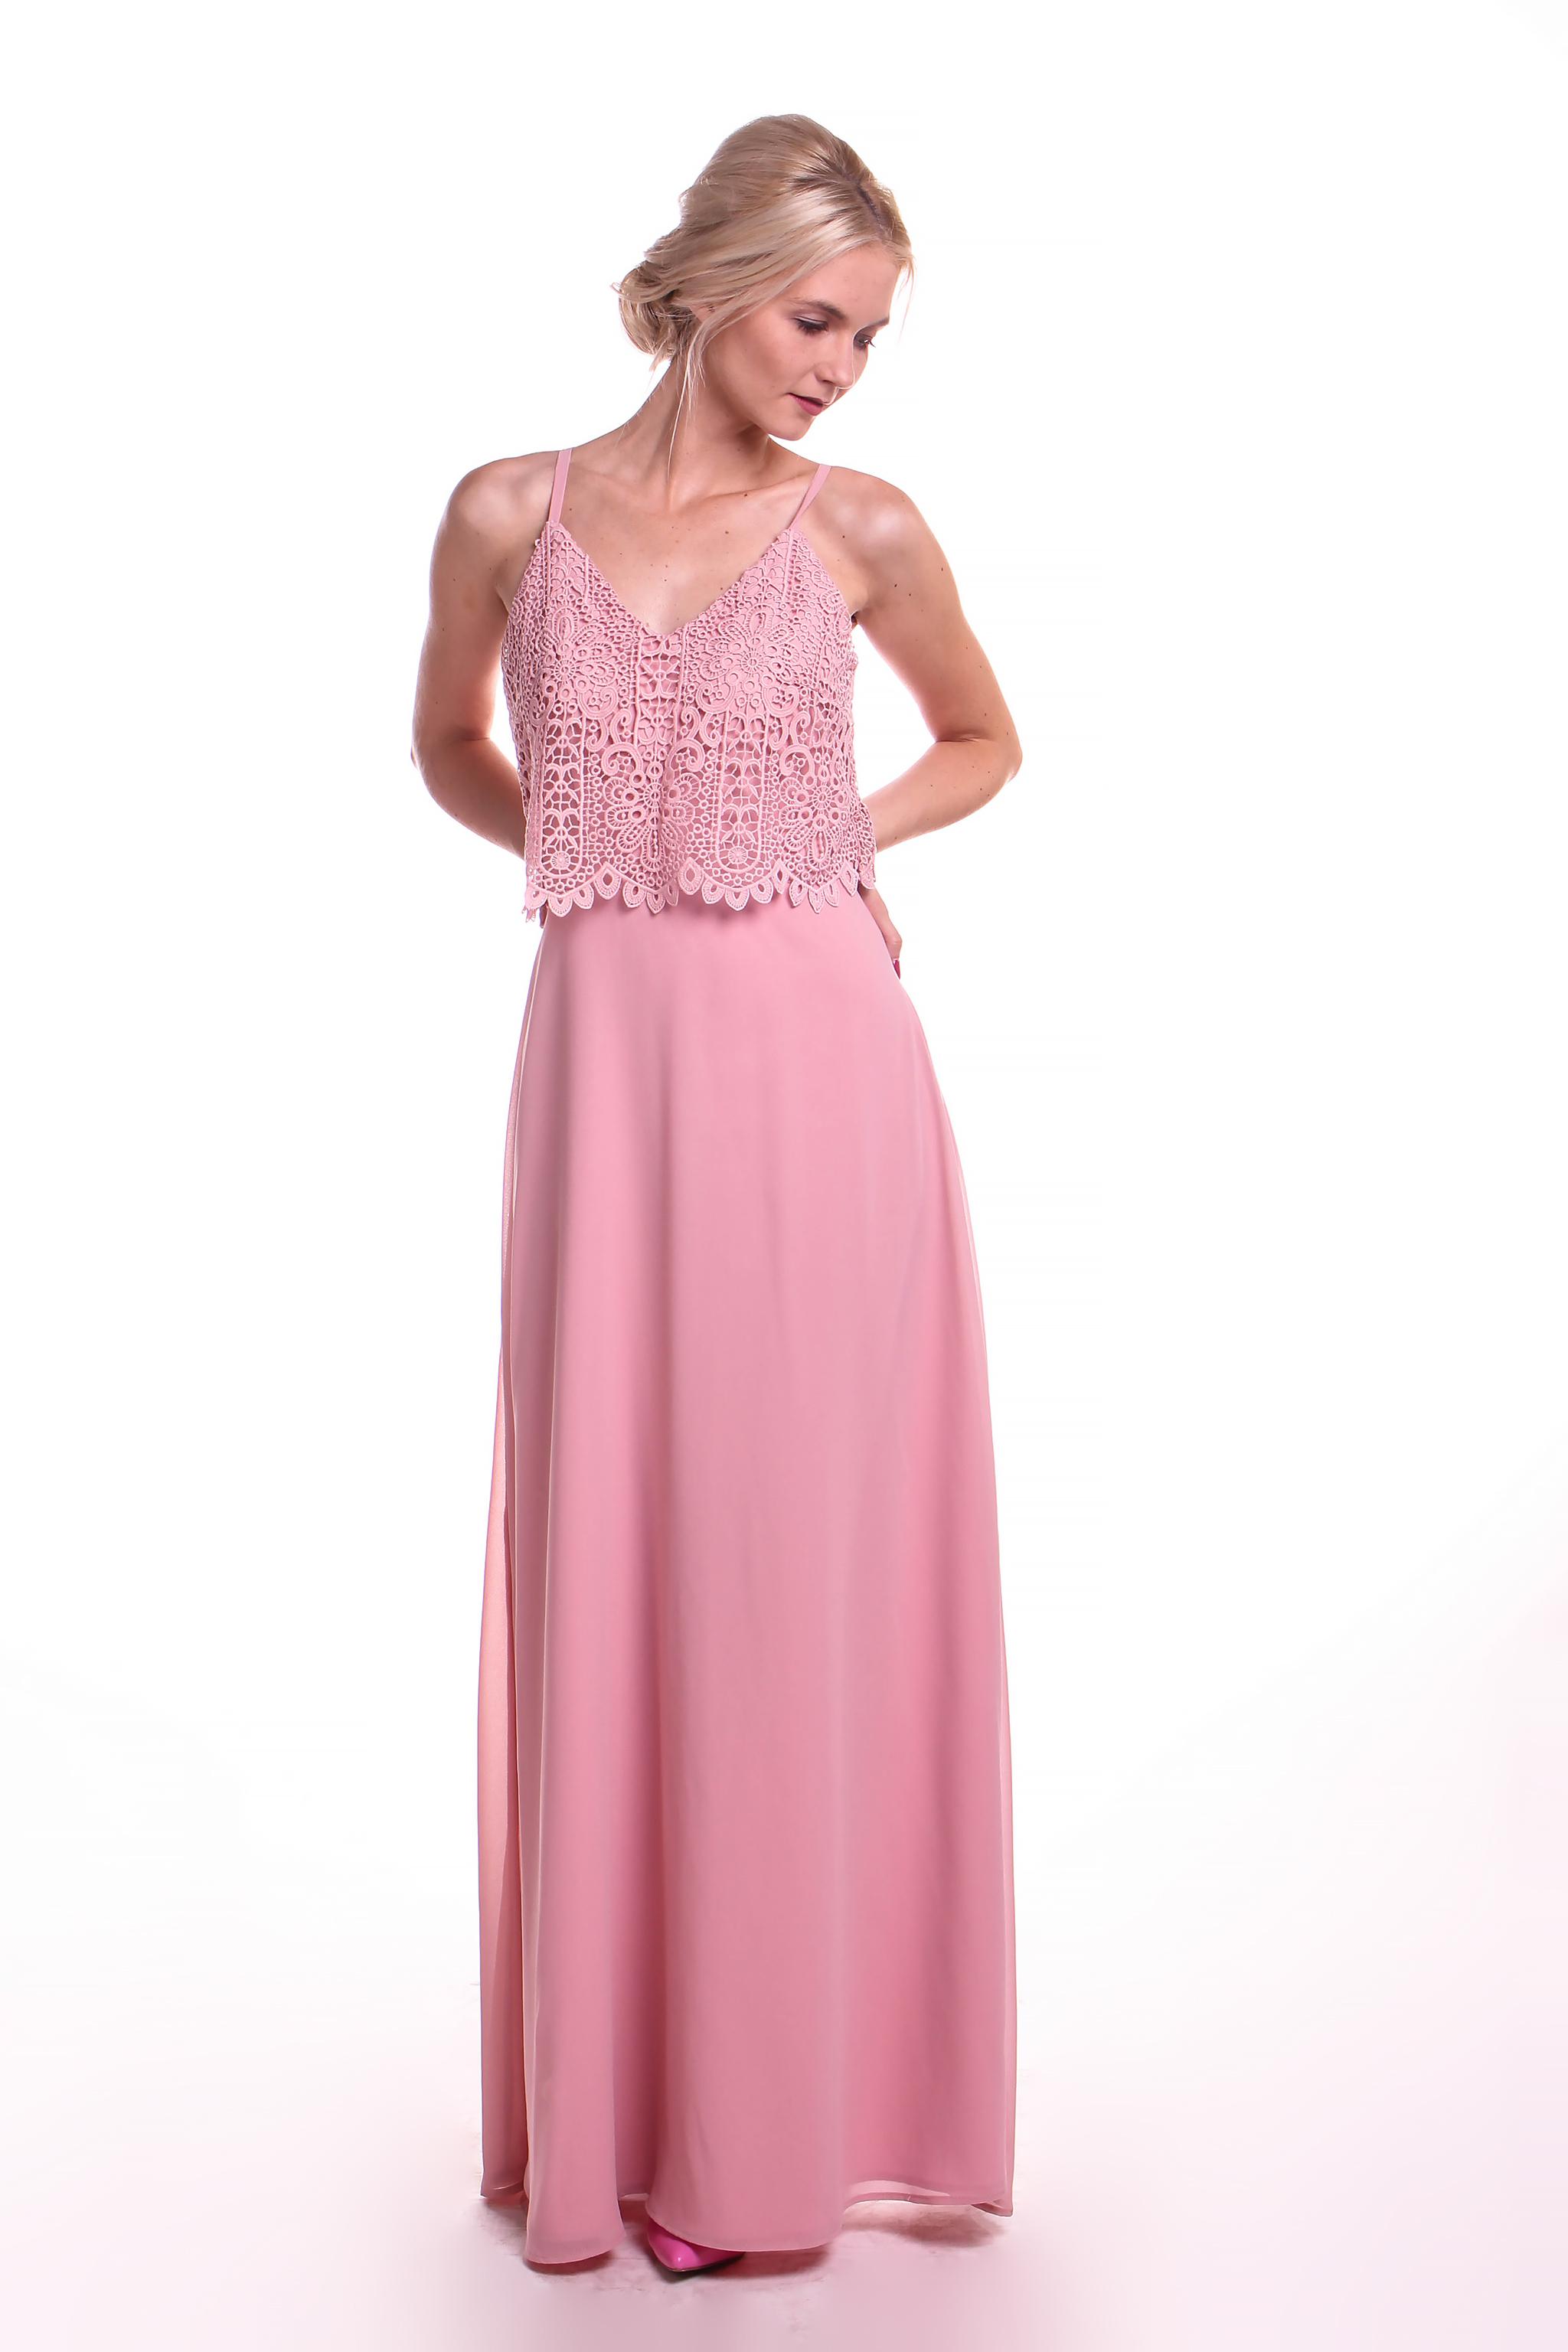 Obrázok 2 Chi-Chi London ružové maxi šaty 3daab115160